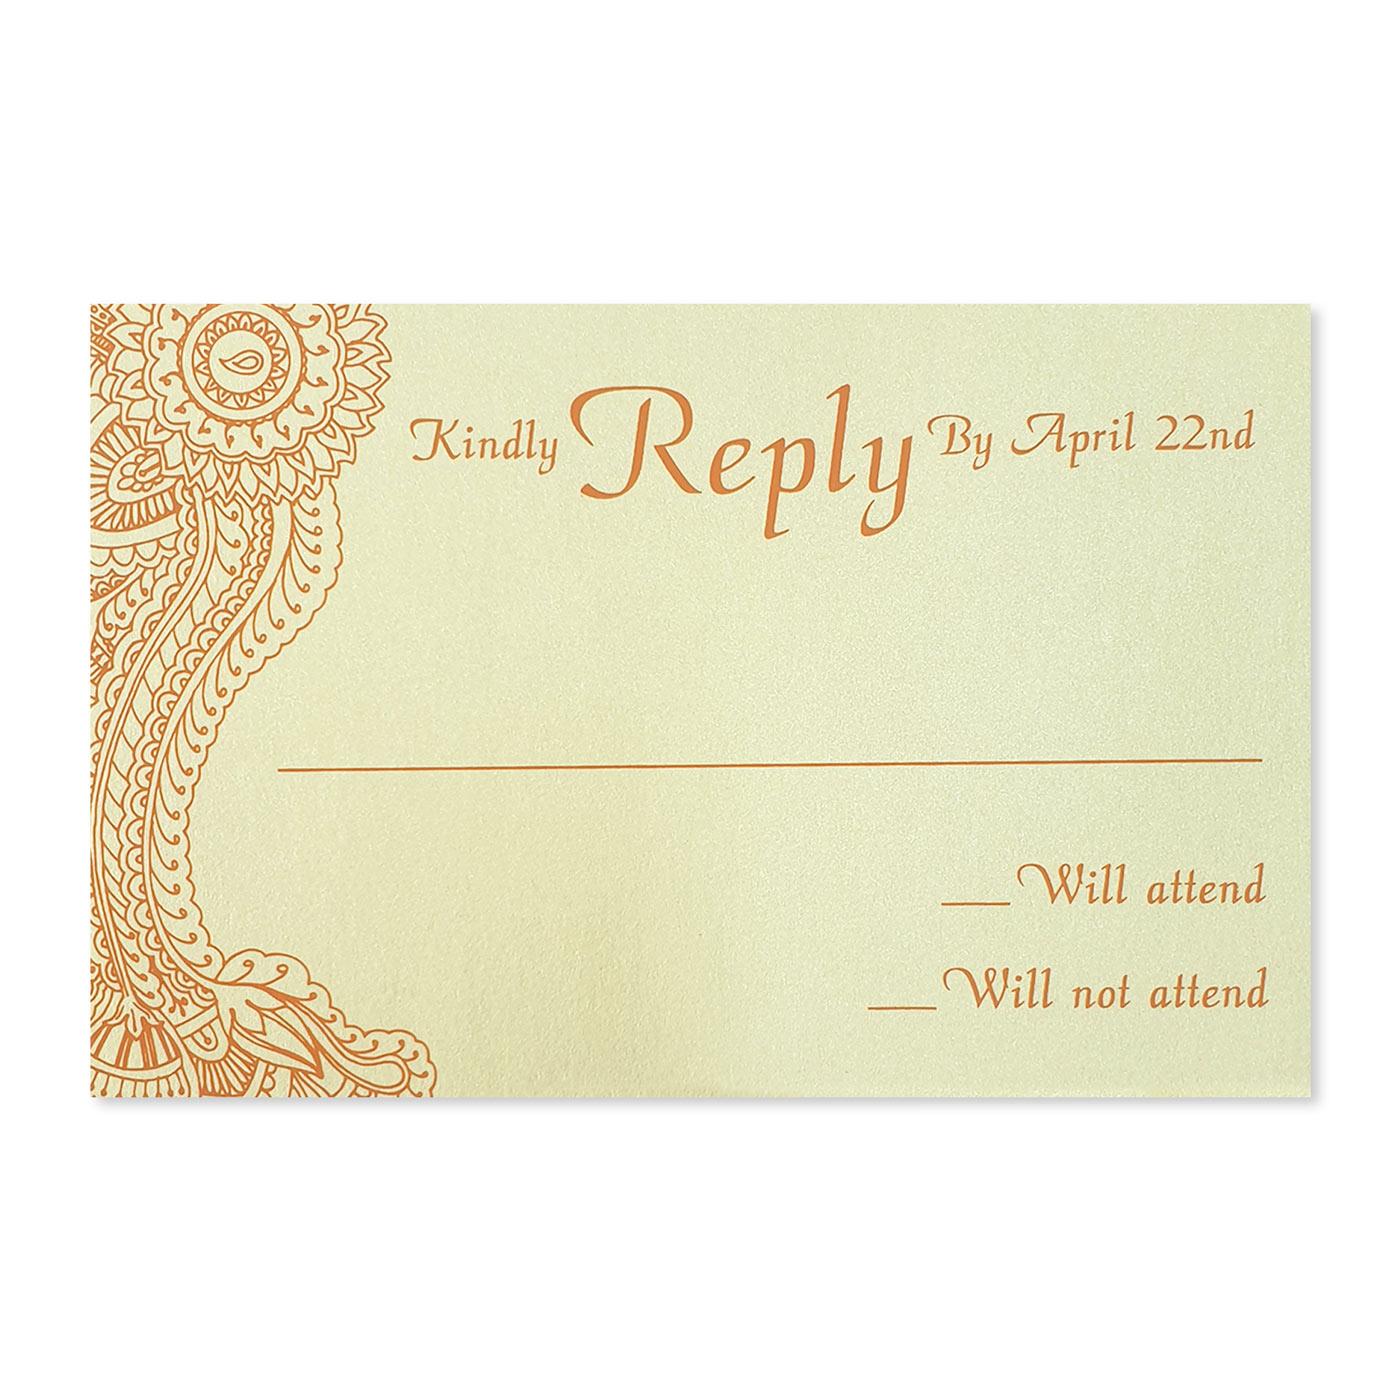 RSVP Cards : CRSVP-ATOMIC_TANGERINE - IndianWeddingCards